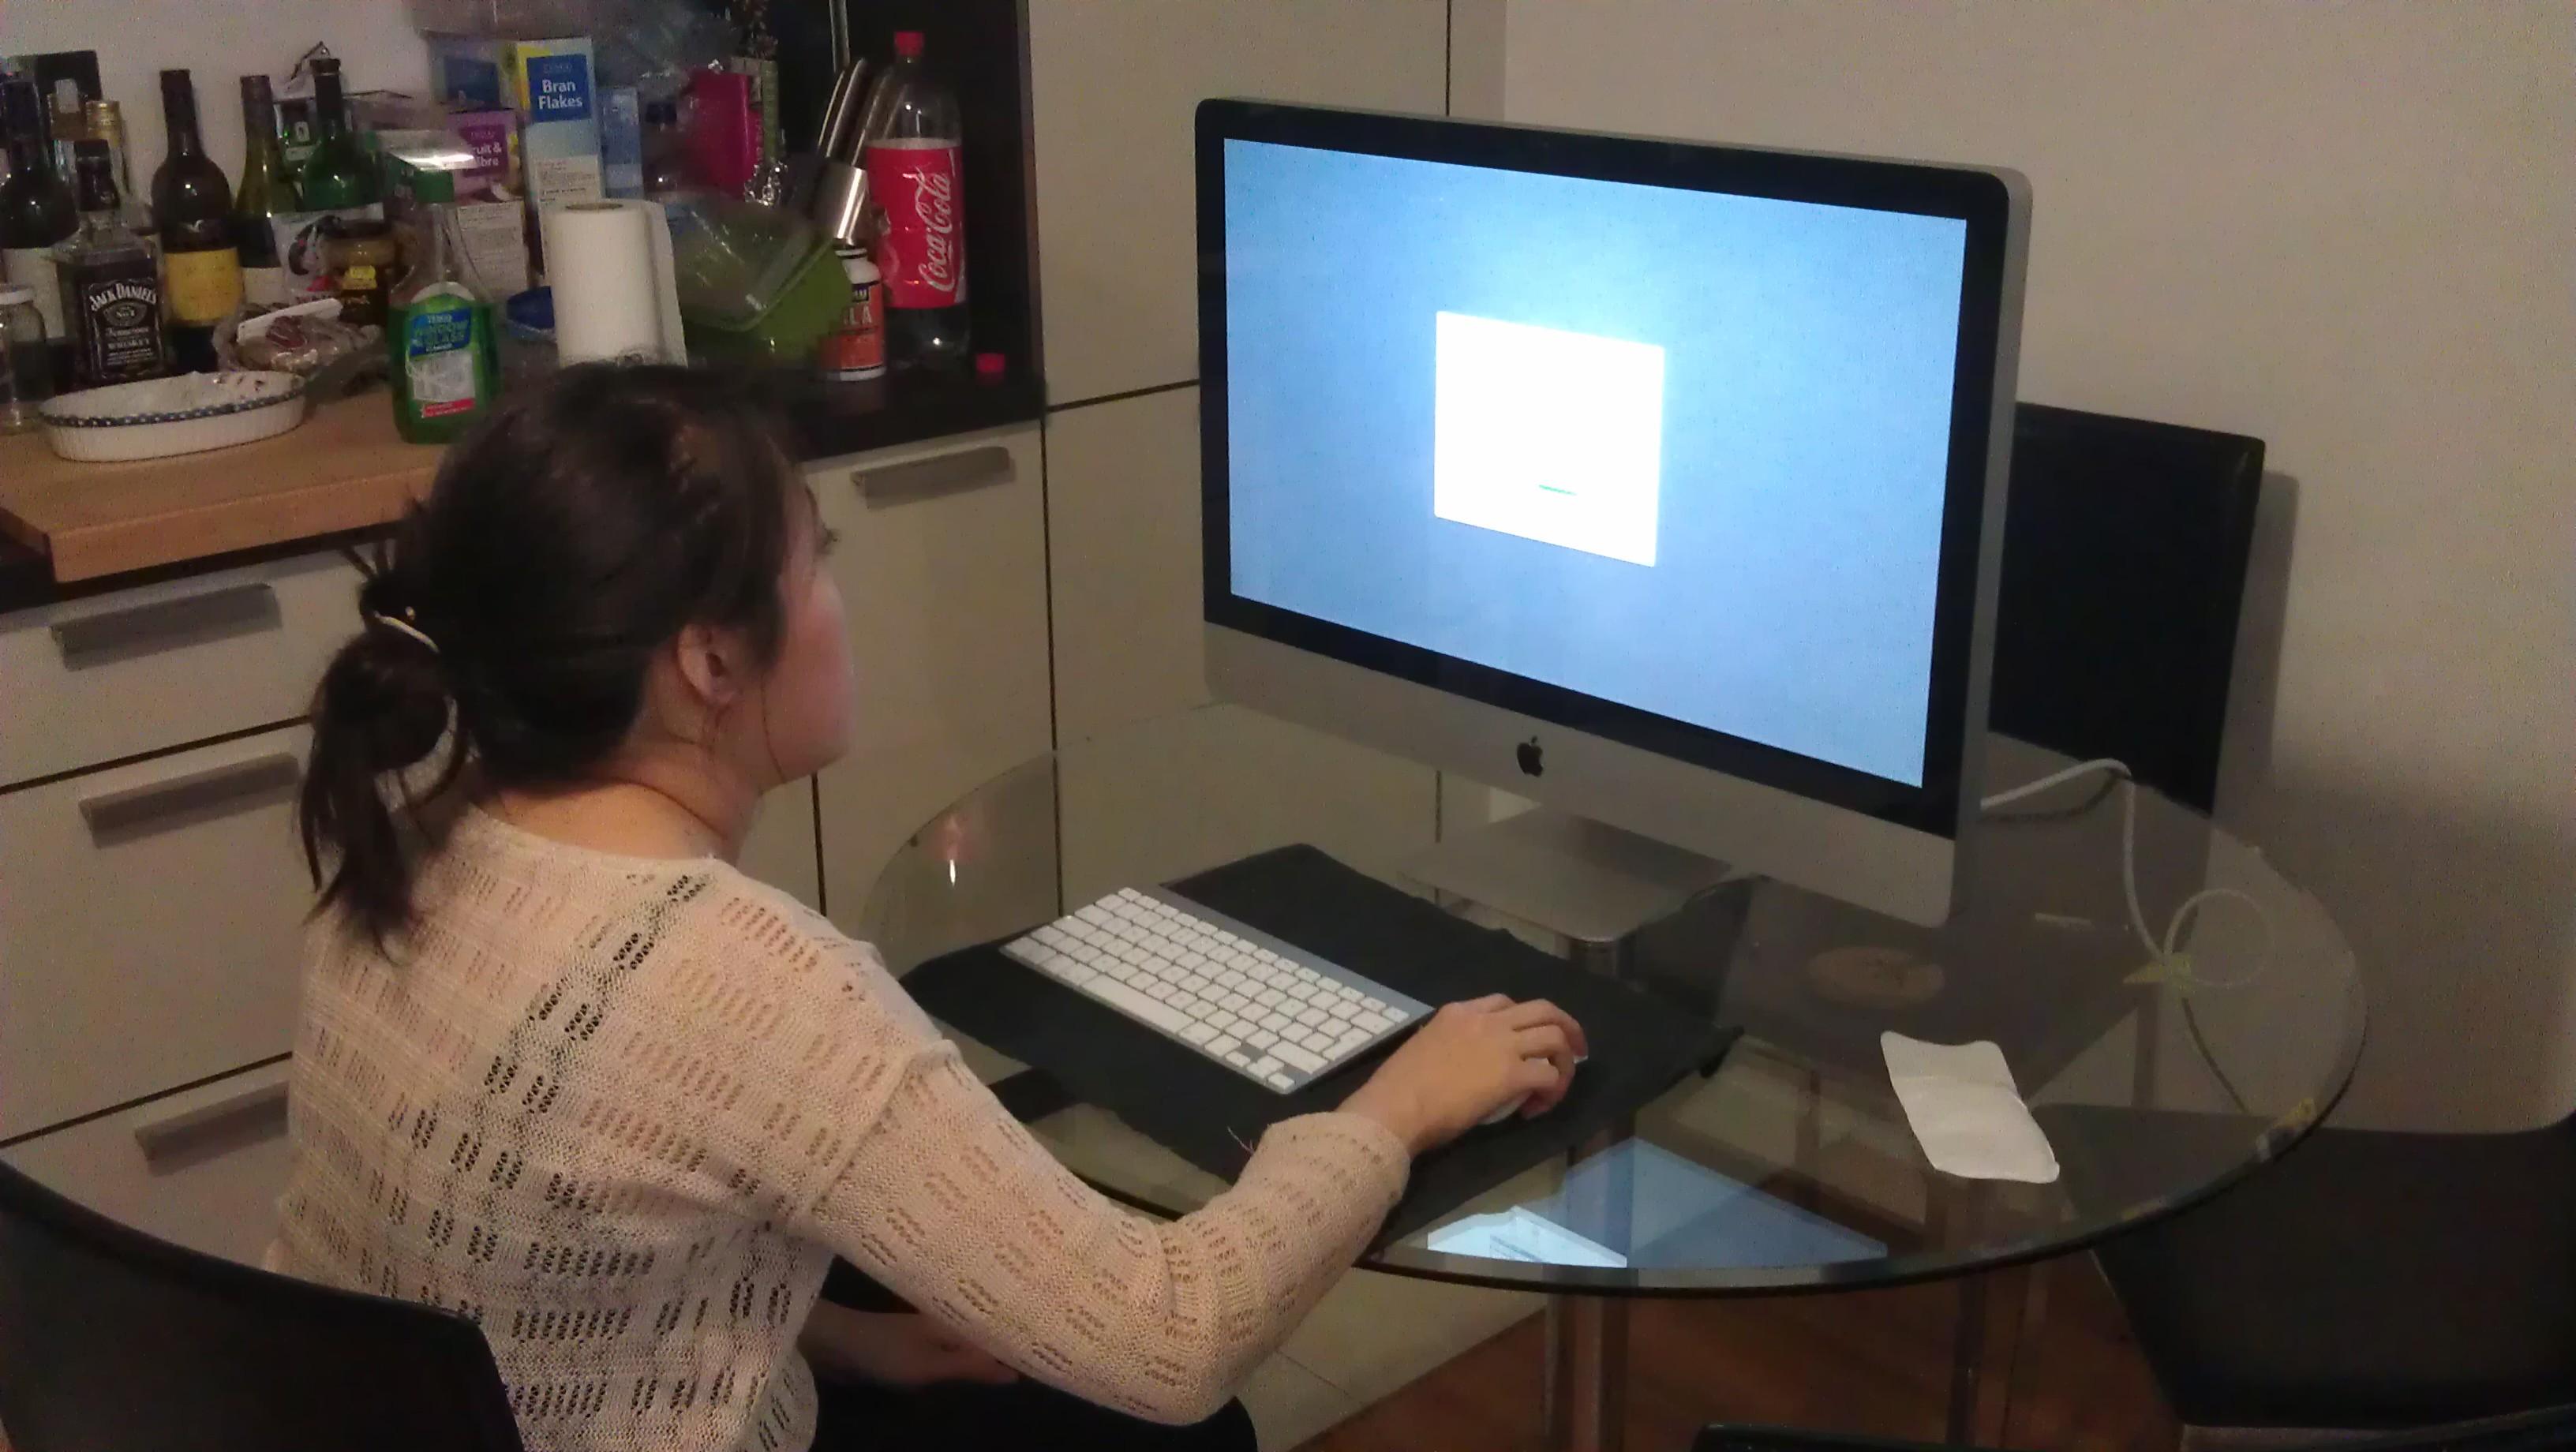 Cheryl on the iMac